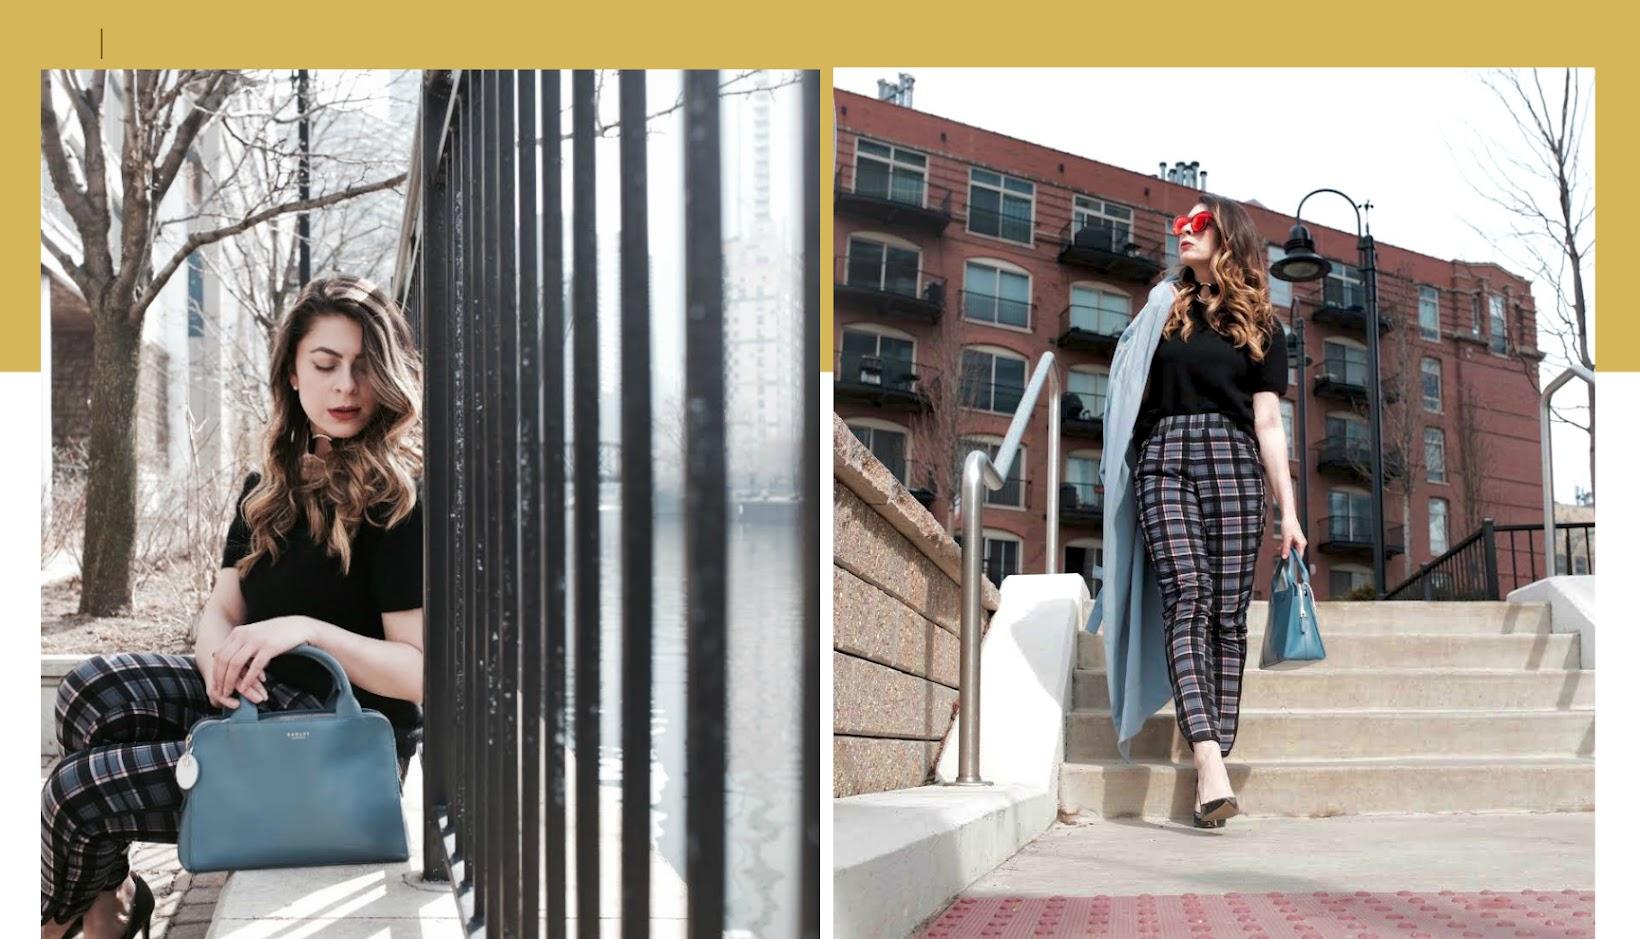 MEDIUM ZIPTOP SATCHEL, Millbank satchel from Radley London, Chicago riverwalk, Chicago fashion blogger, Fashionlingual, Desirée Velásquez, Latina fashion blogger, Chicago style blogger, Chicago blogger, bloguera de moda, River North Chicago,